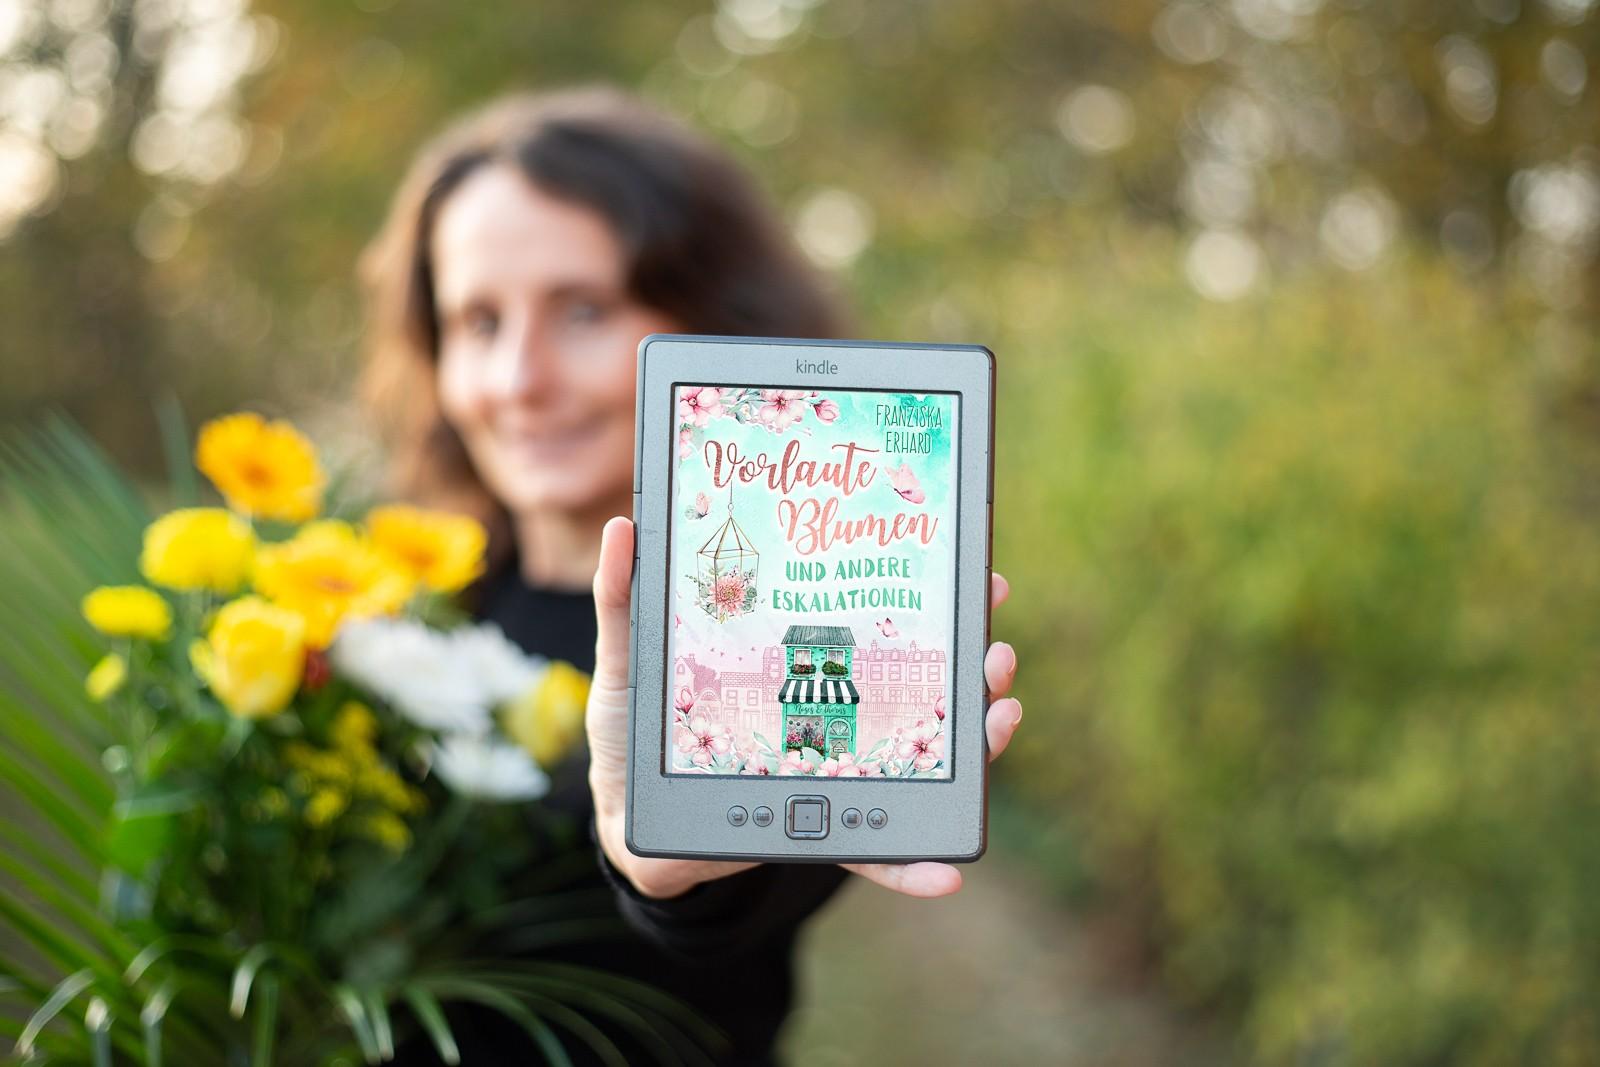 Vorlaut Blumen andere Eskalation - Franziska Erhard